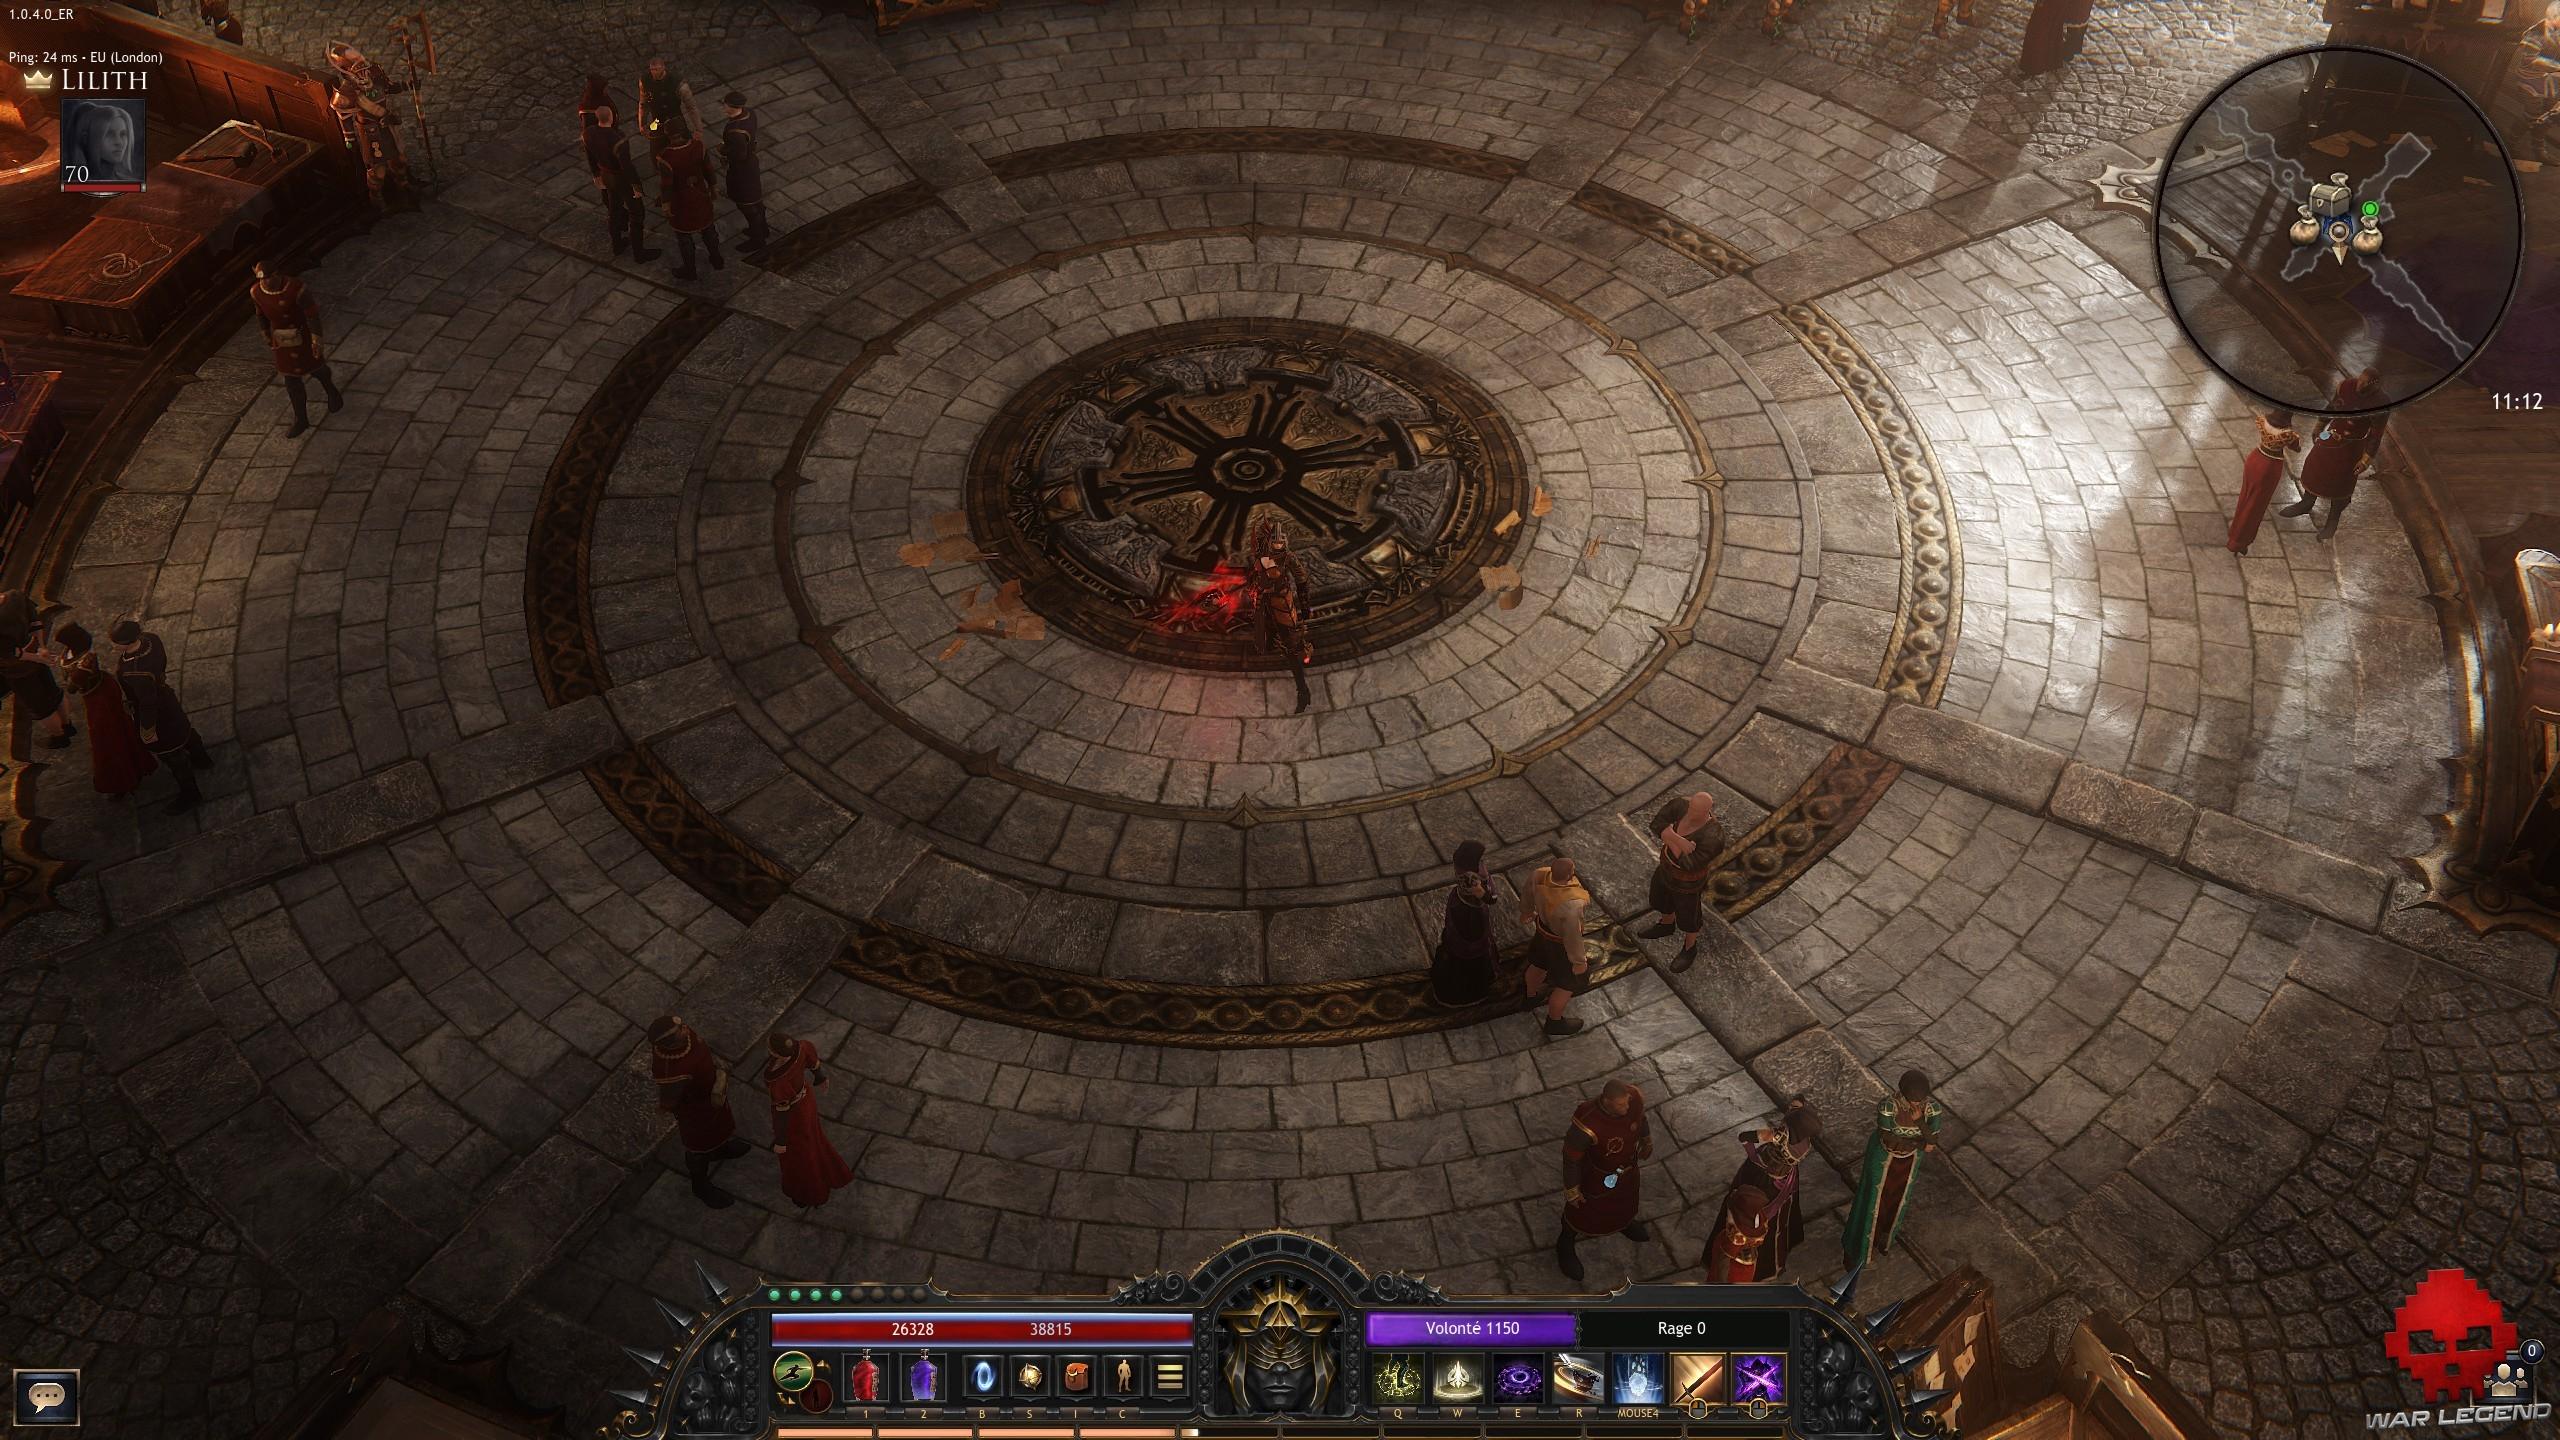 WL wolcen lords of mayhem stormfall